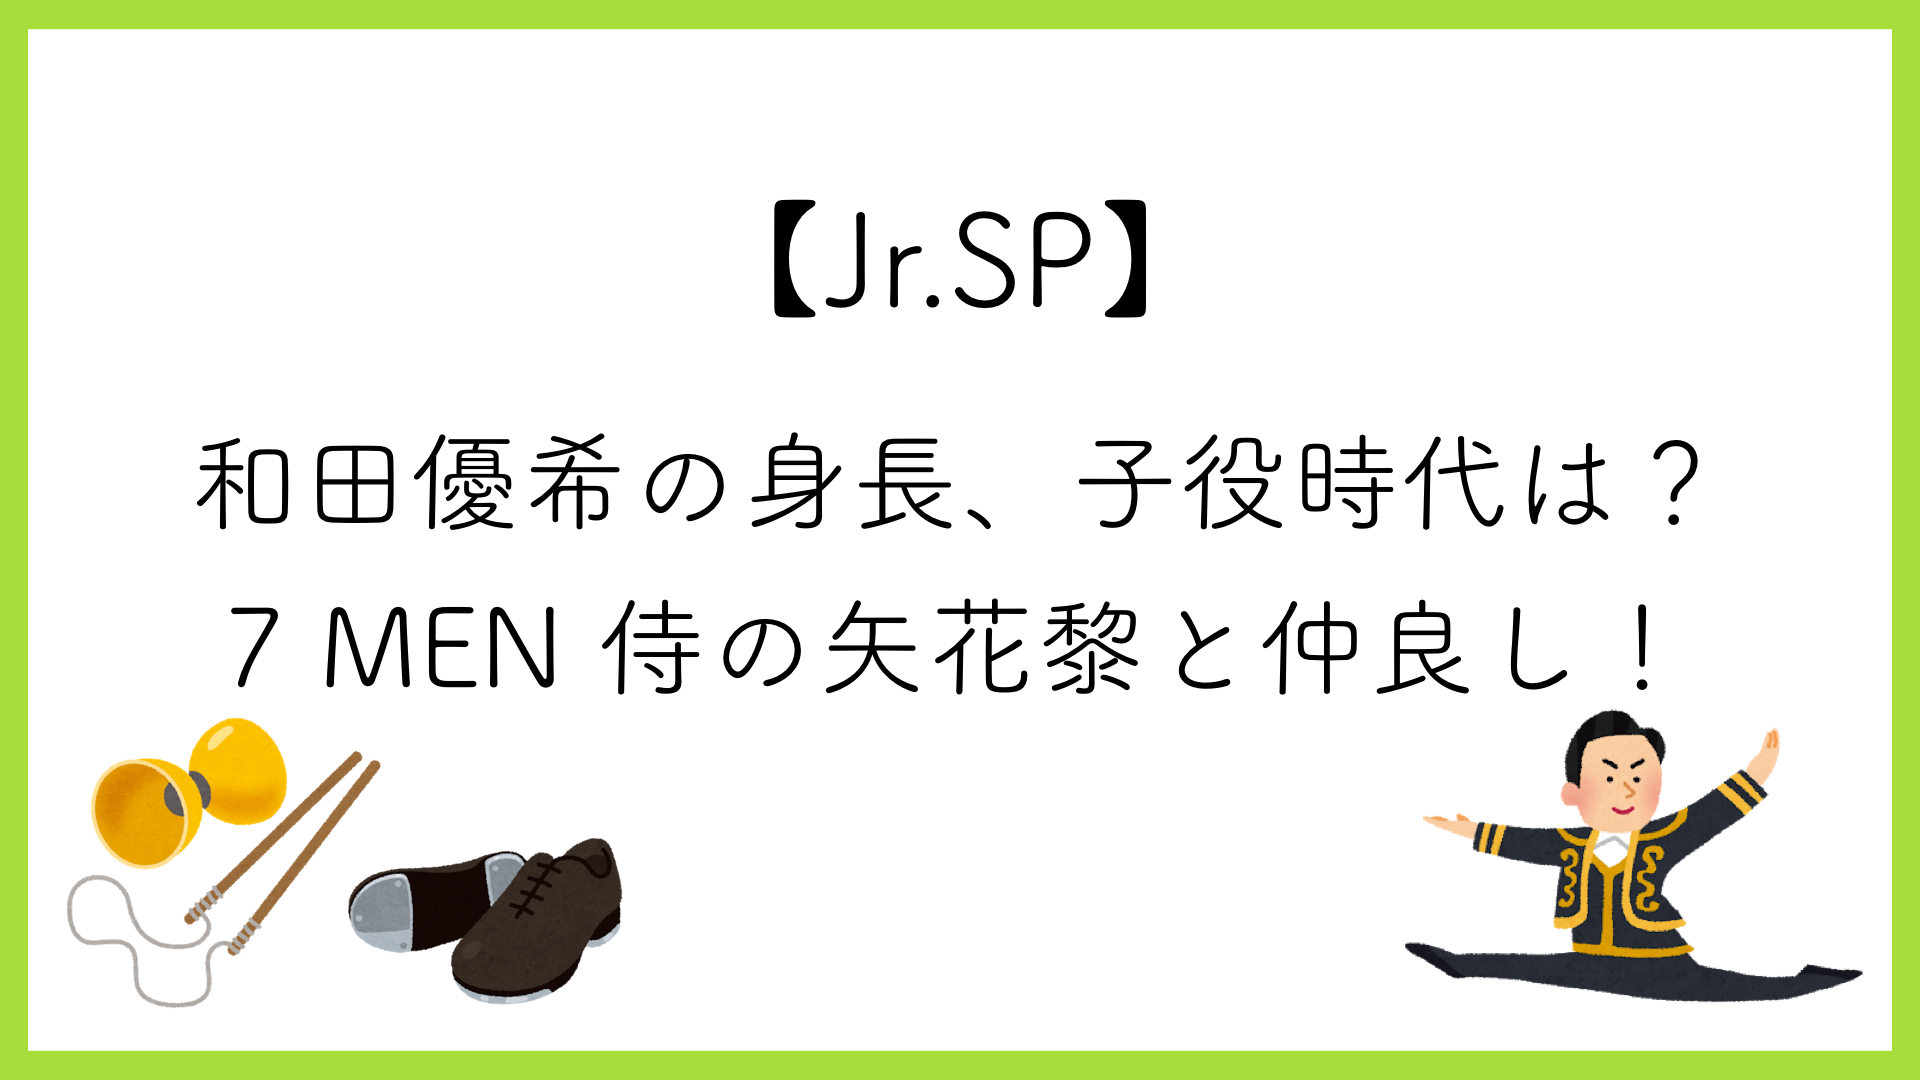 【Jr.SP】和田優希の身長、子役時代は?7 MEN 侍の矢花黎と仲良し!